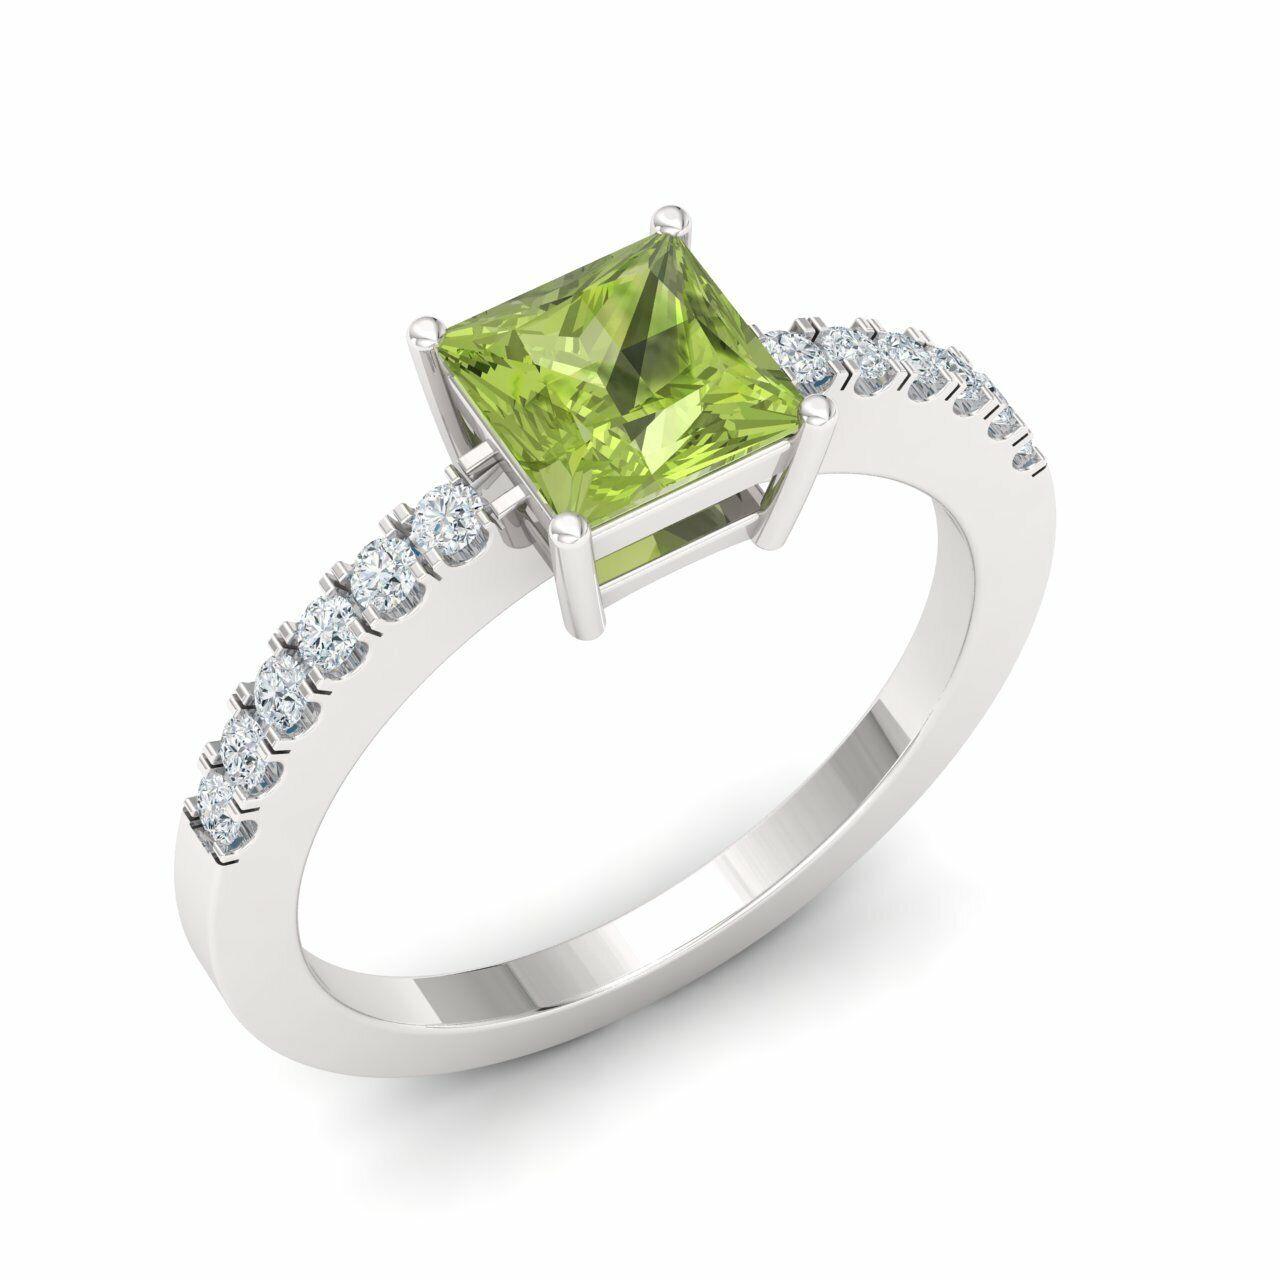 Certified 1.04 Ct Princess Cut Peridot & Diamond Engagement Ring 14K White gold